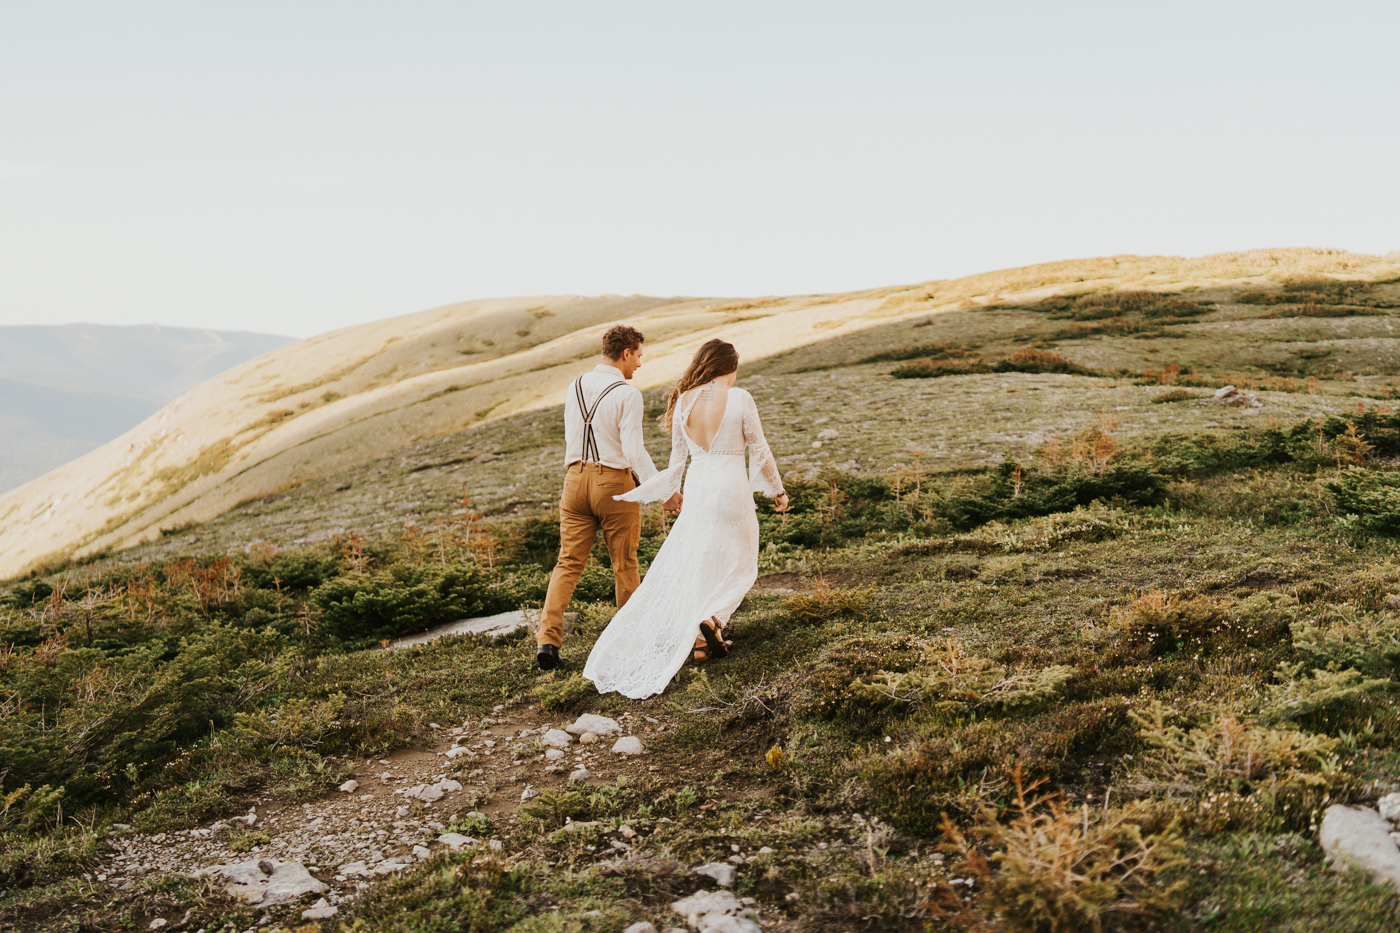 tyraephotography_photographer_wedding_elopement_engagement_photography-07909.jpg